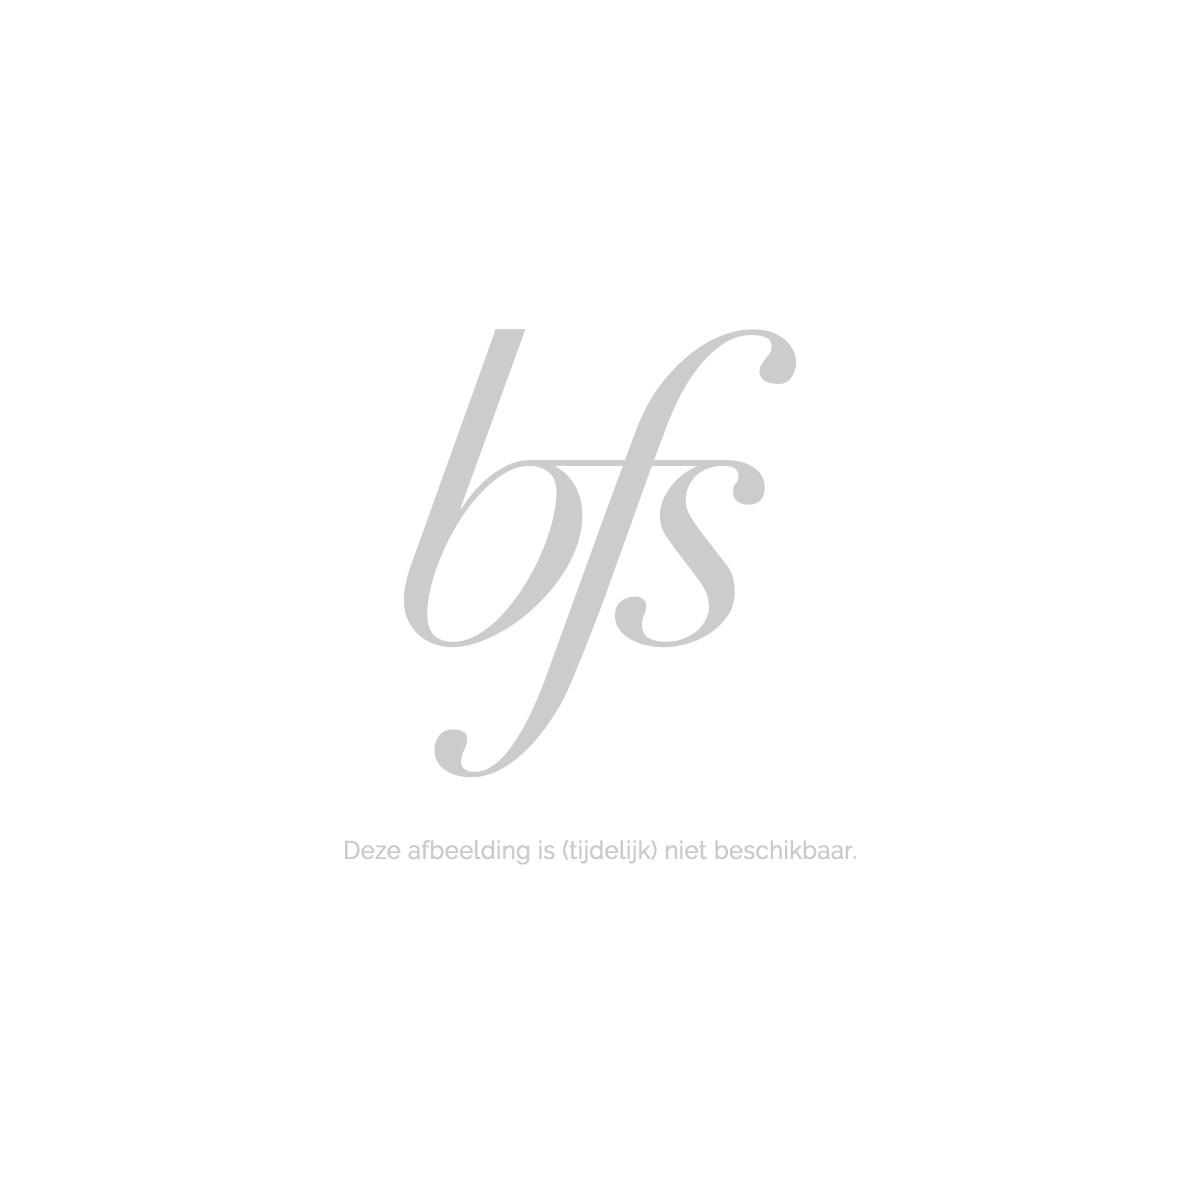 Givenchy Gentleman Eau De Toilette Spray (3) 100 Ml